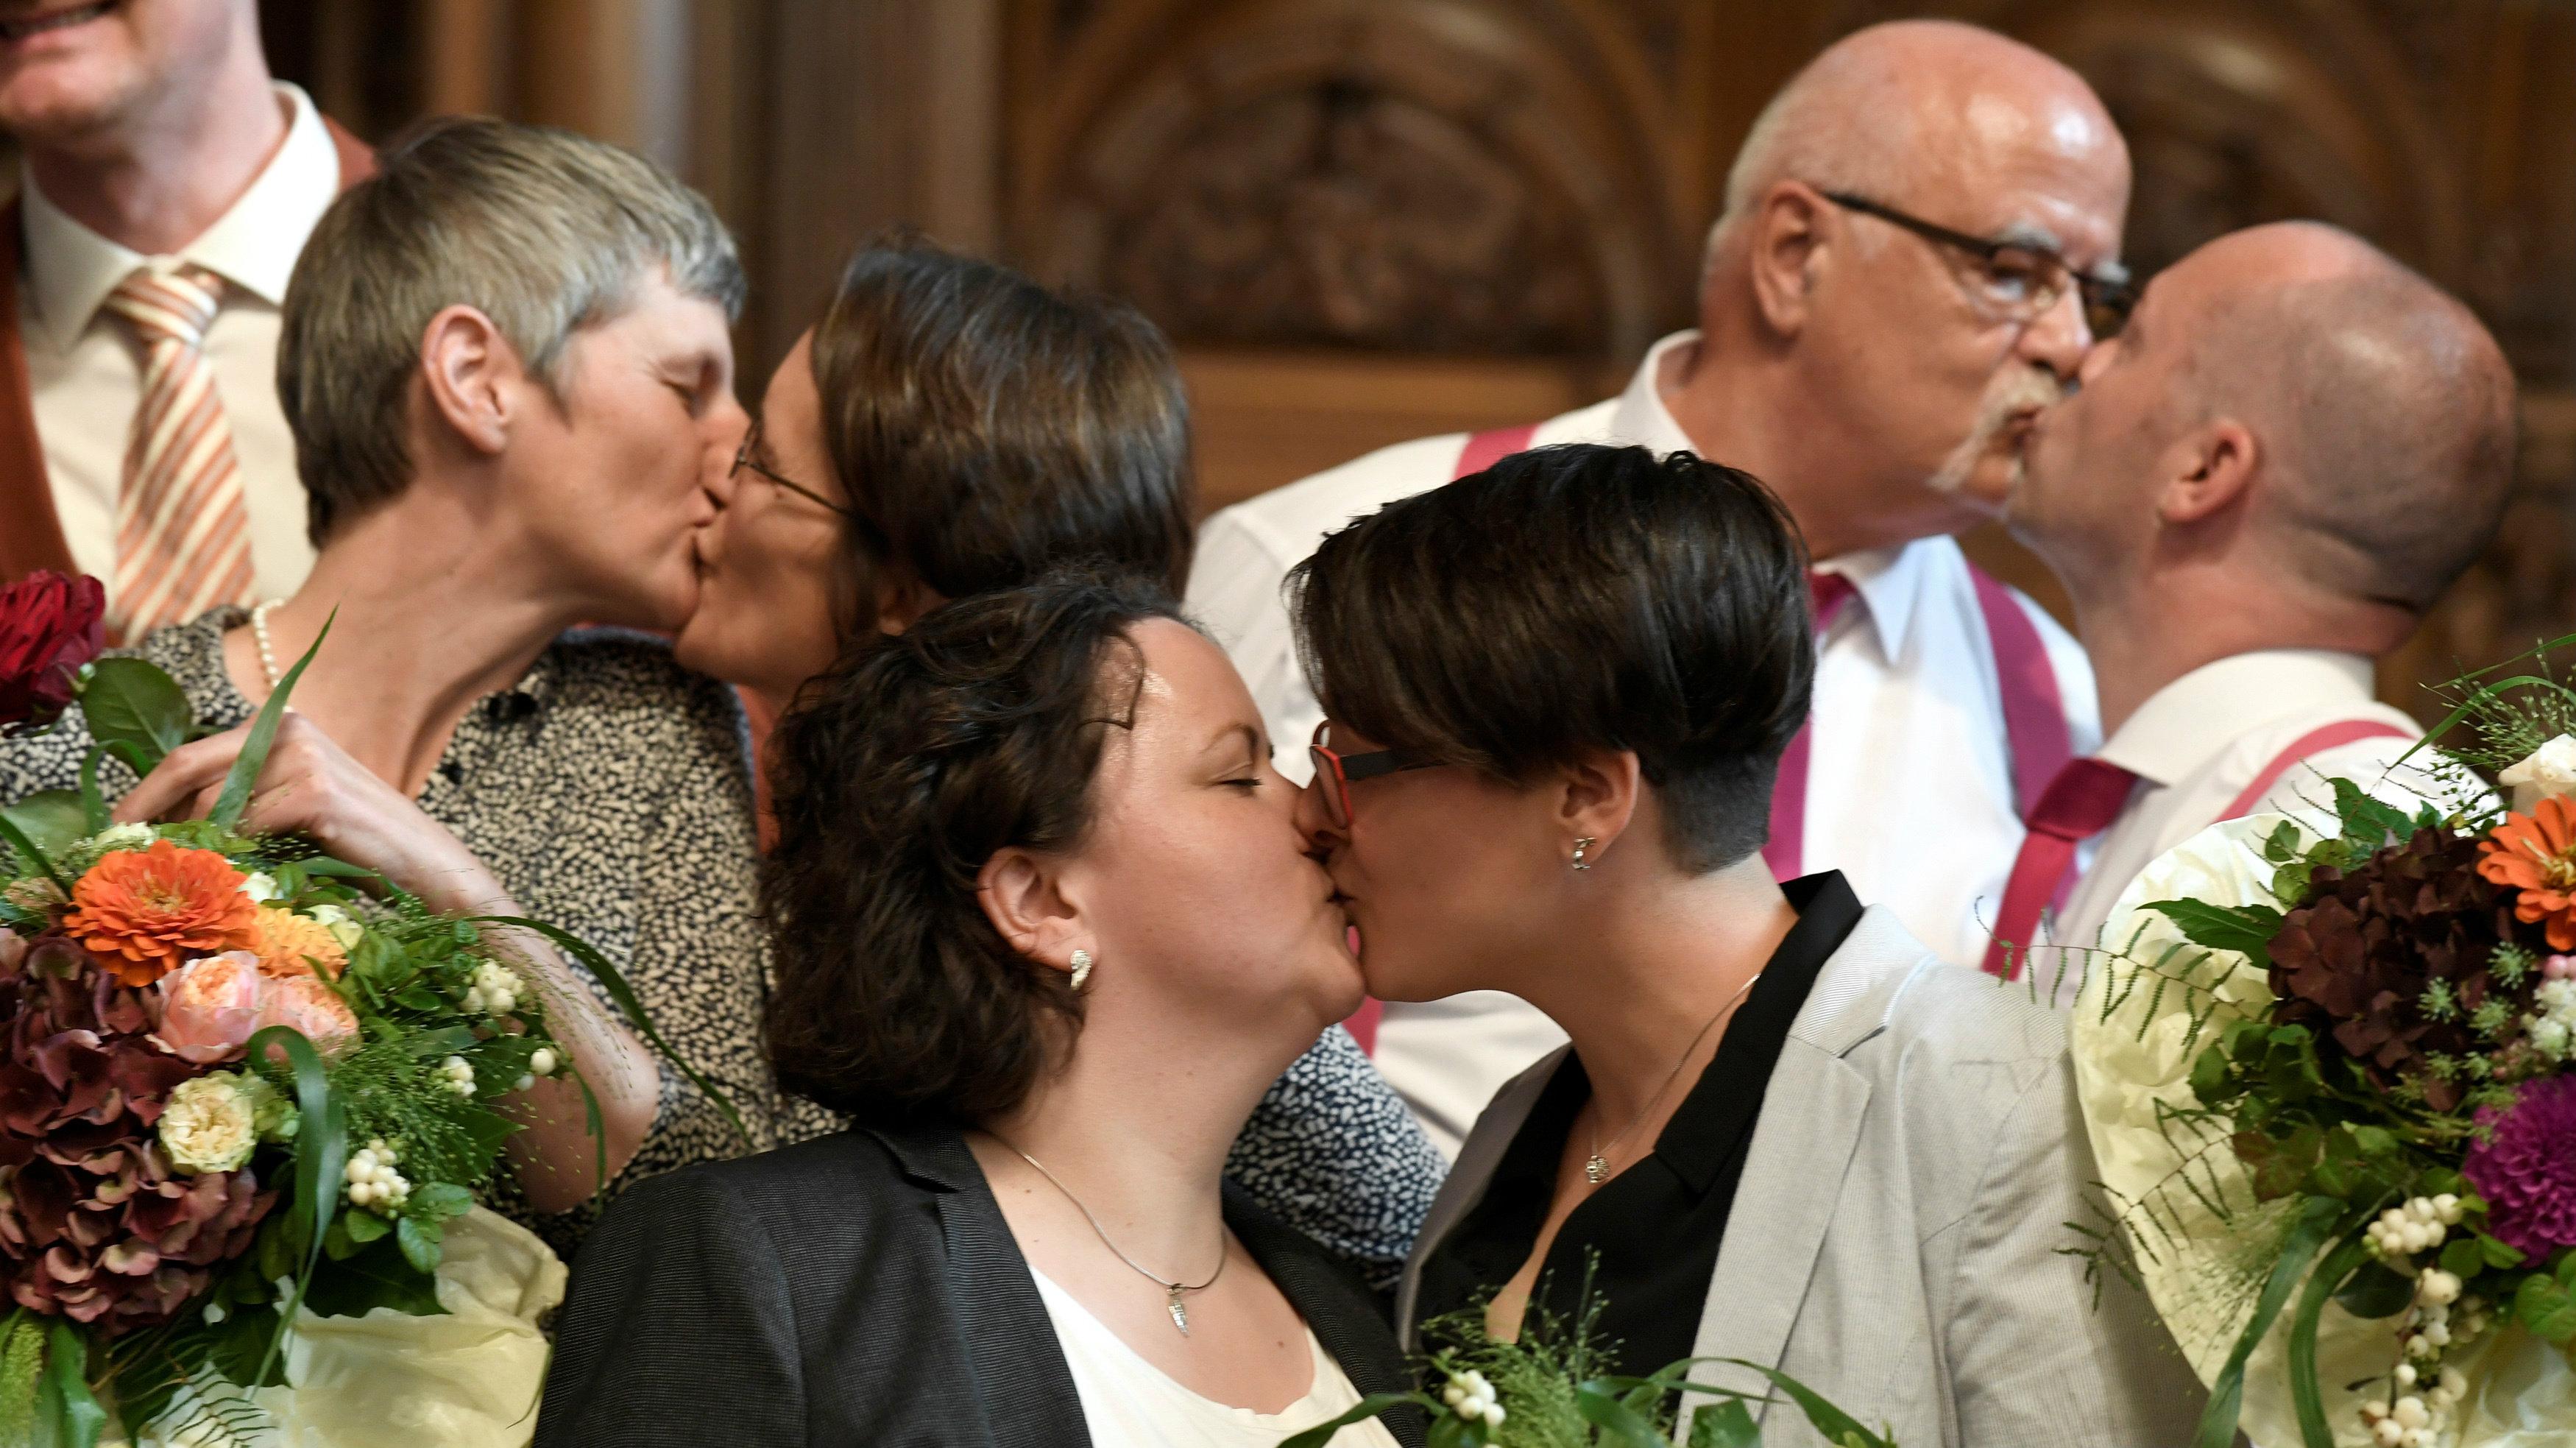 EU ECJ spouse definition gay marriage same sex marriage